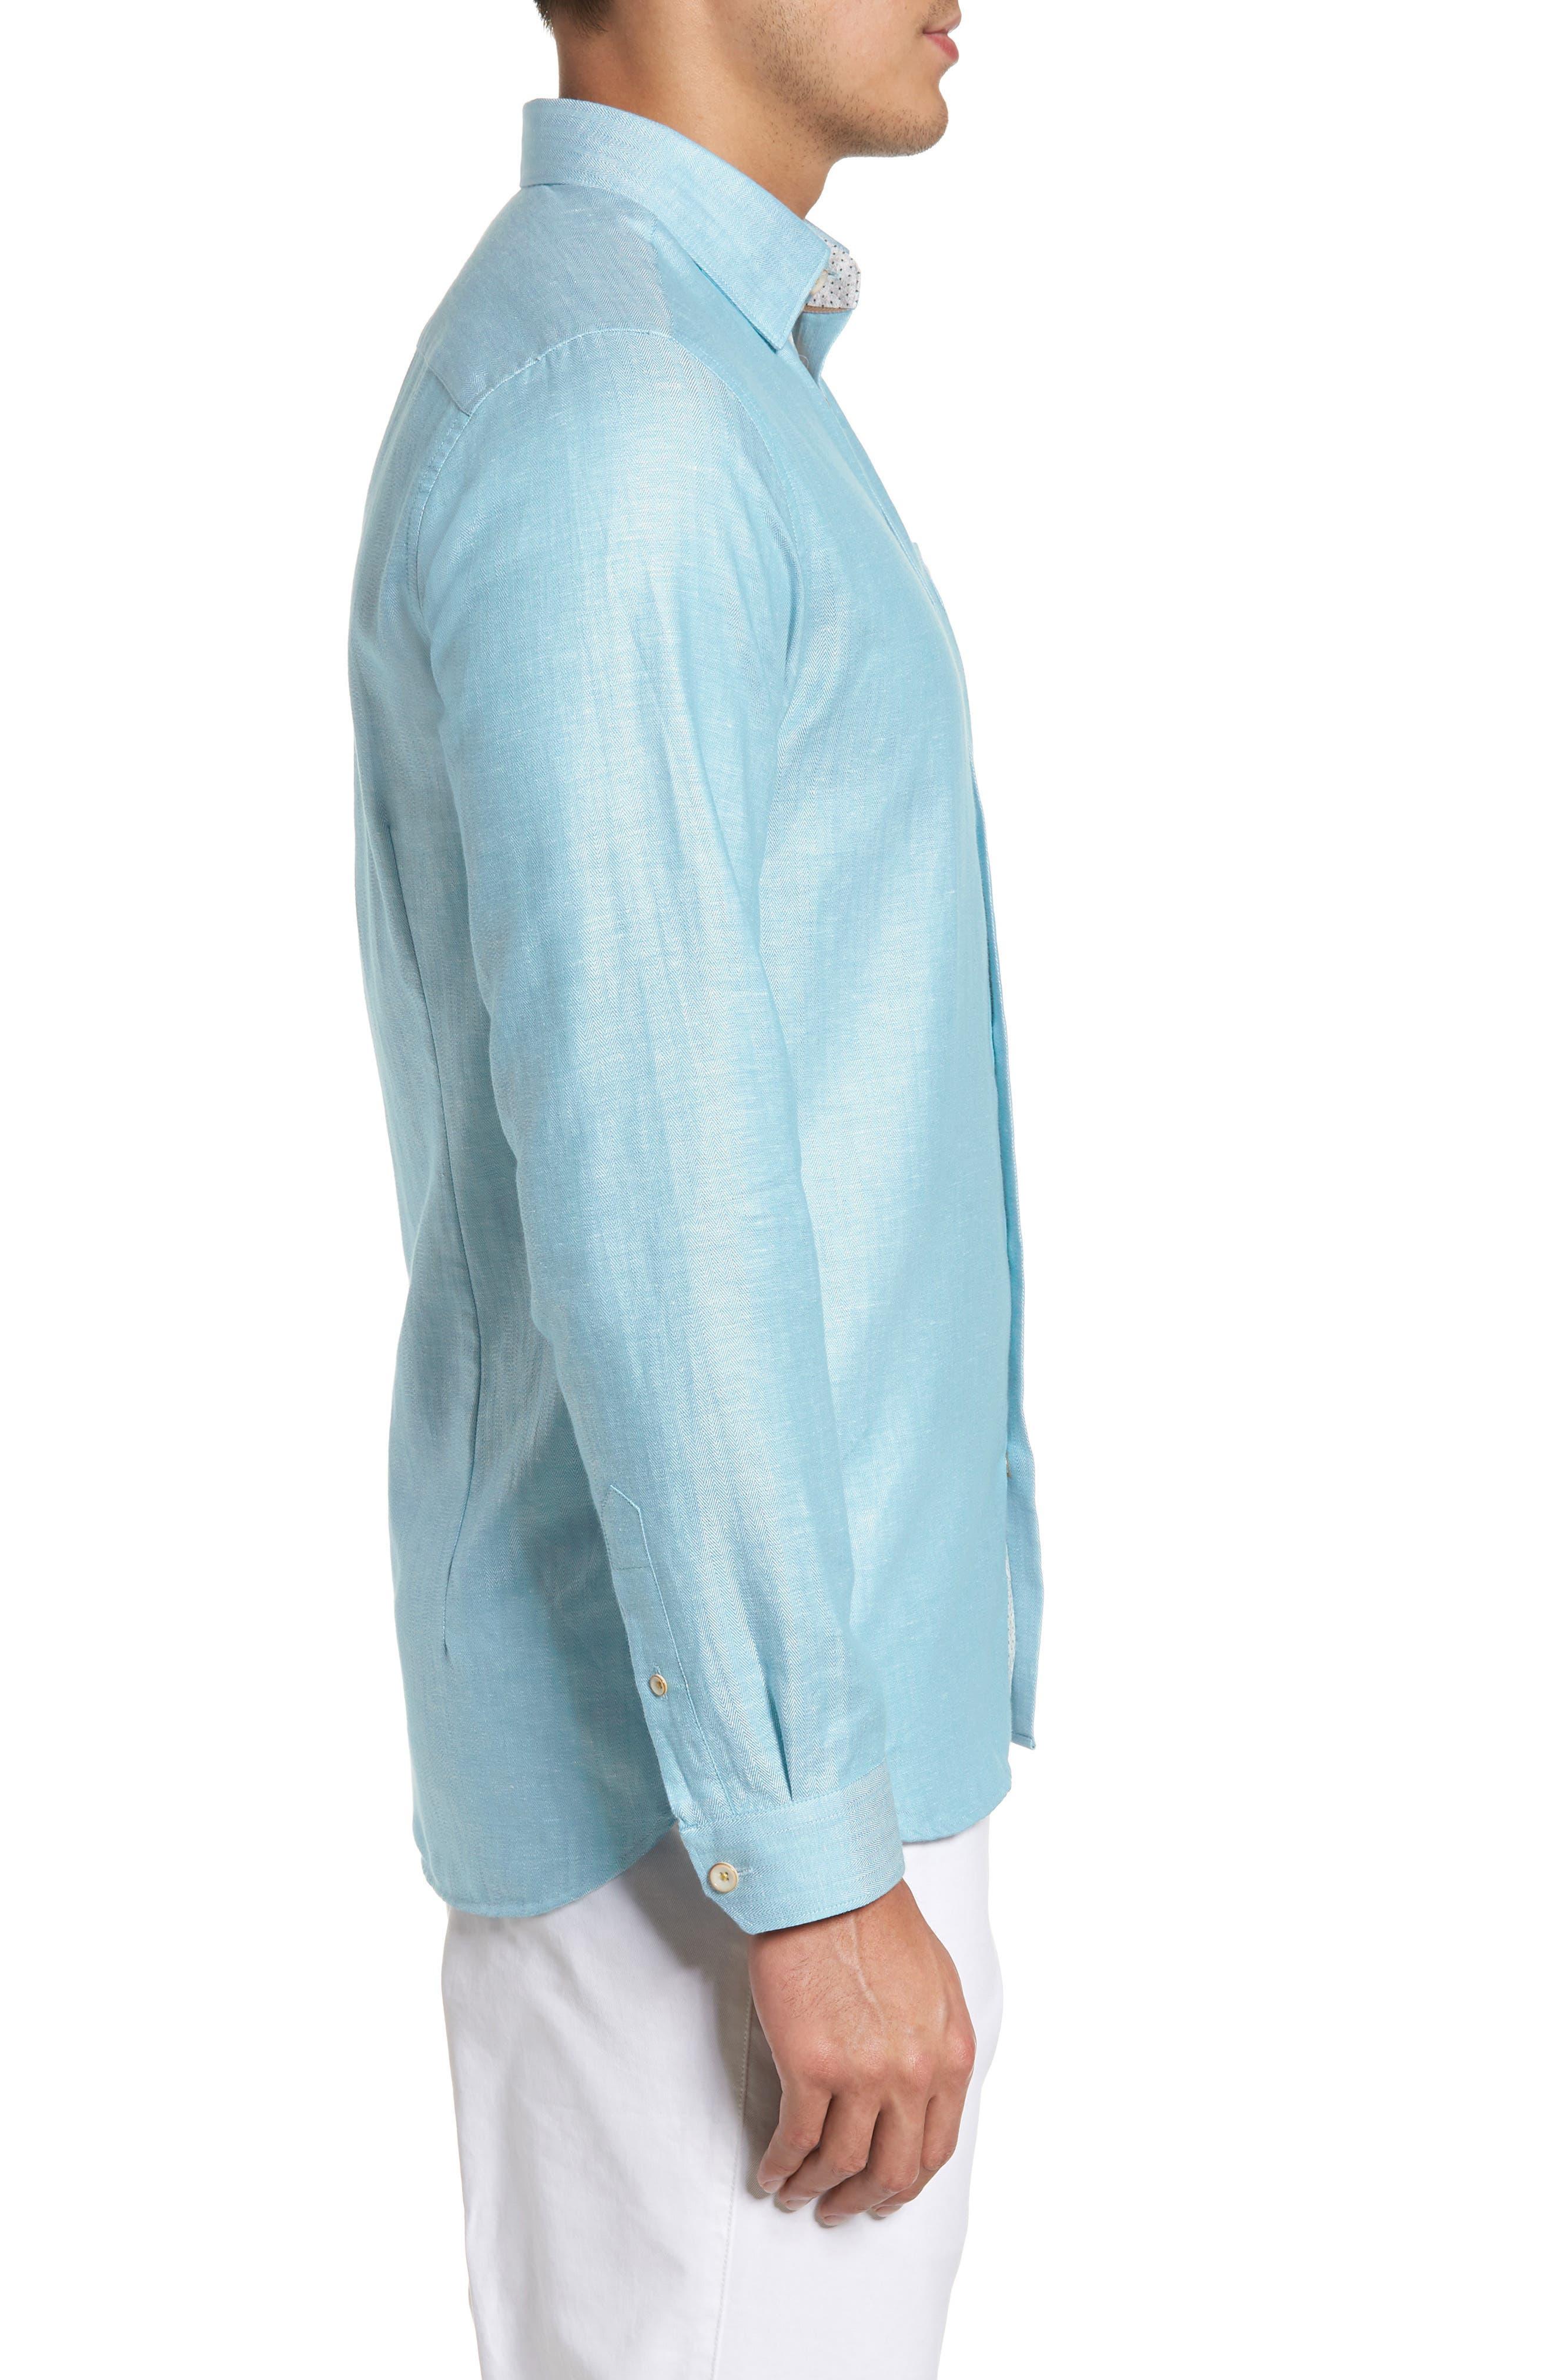 Linlins Herringbone Cotton & Linen Sport Shirt,                             Alternate thumbnail 14, color,